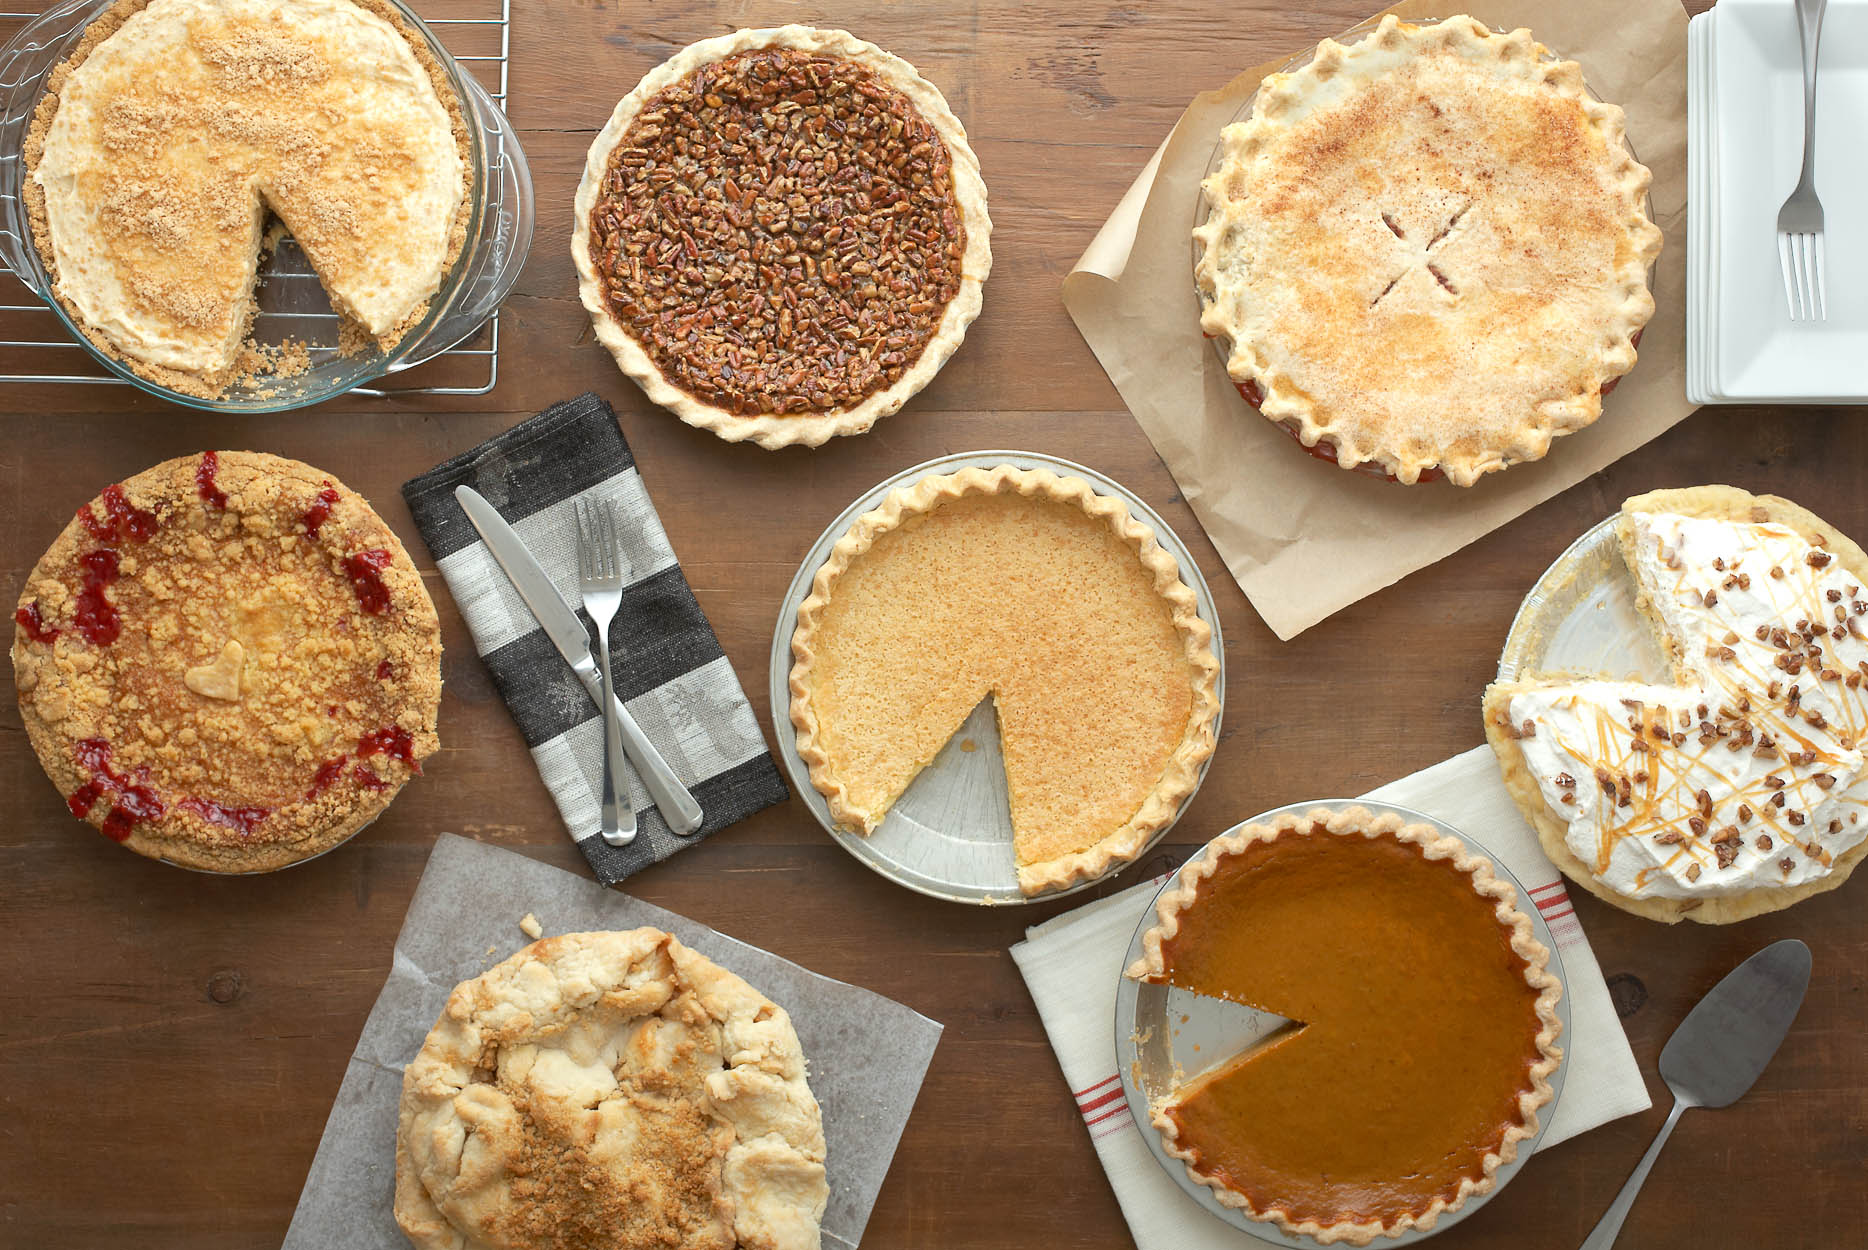 Pie_Shot_002_Final.jpg